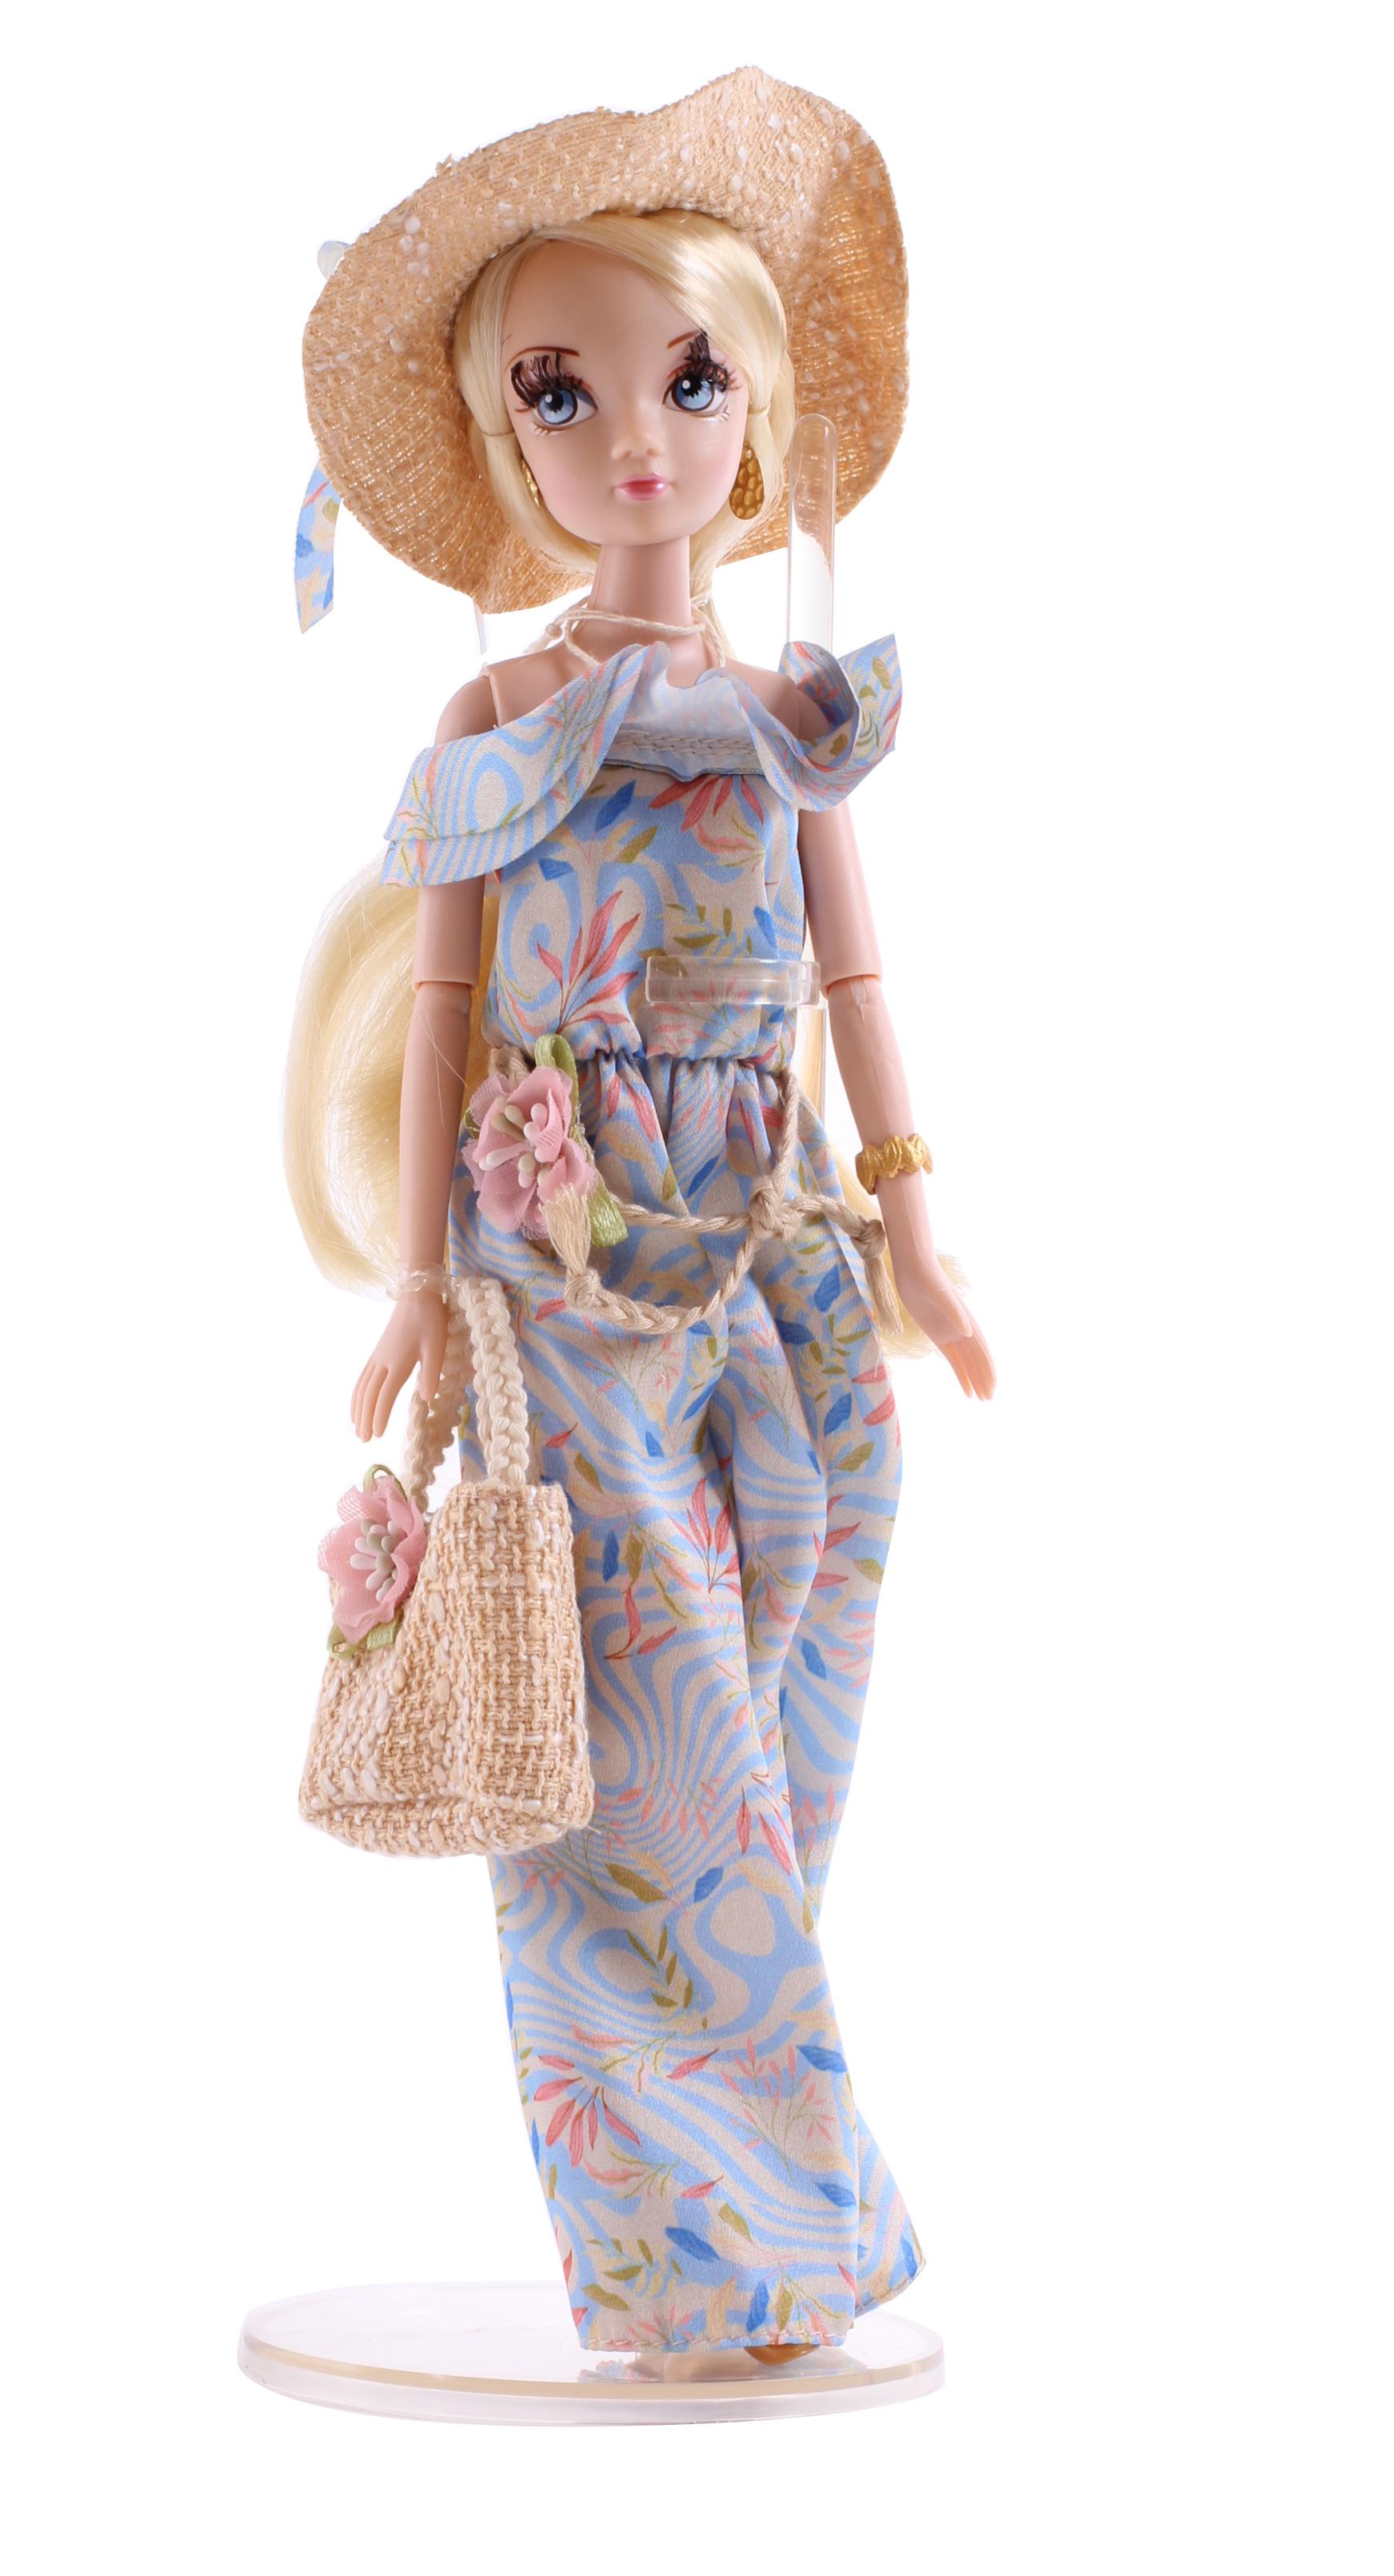 Кукла Sonya Rose Daily collection Пикник